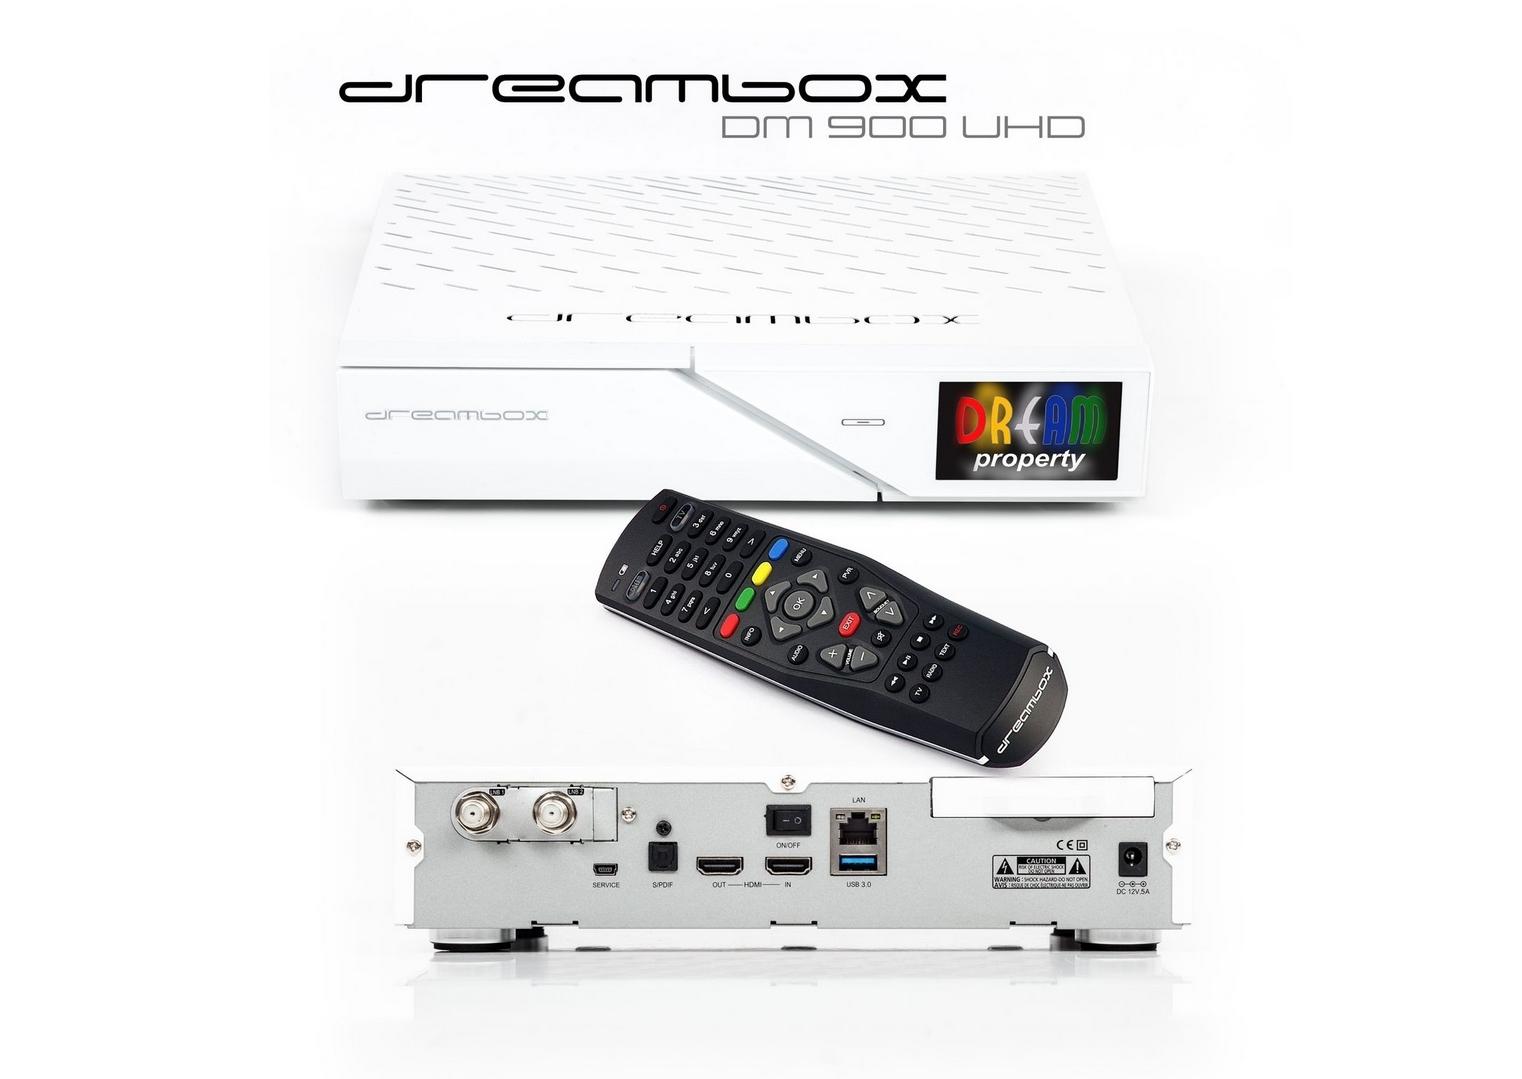 GT-DreamShop - DreamBox 900 UHD 4K E2 Linux 1x DVB-S2 FBC